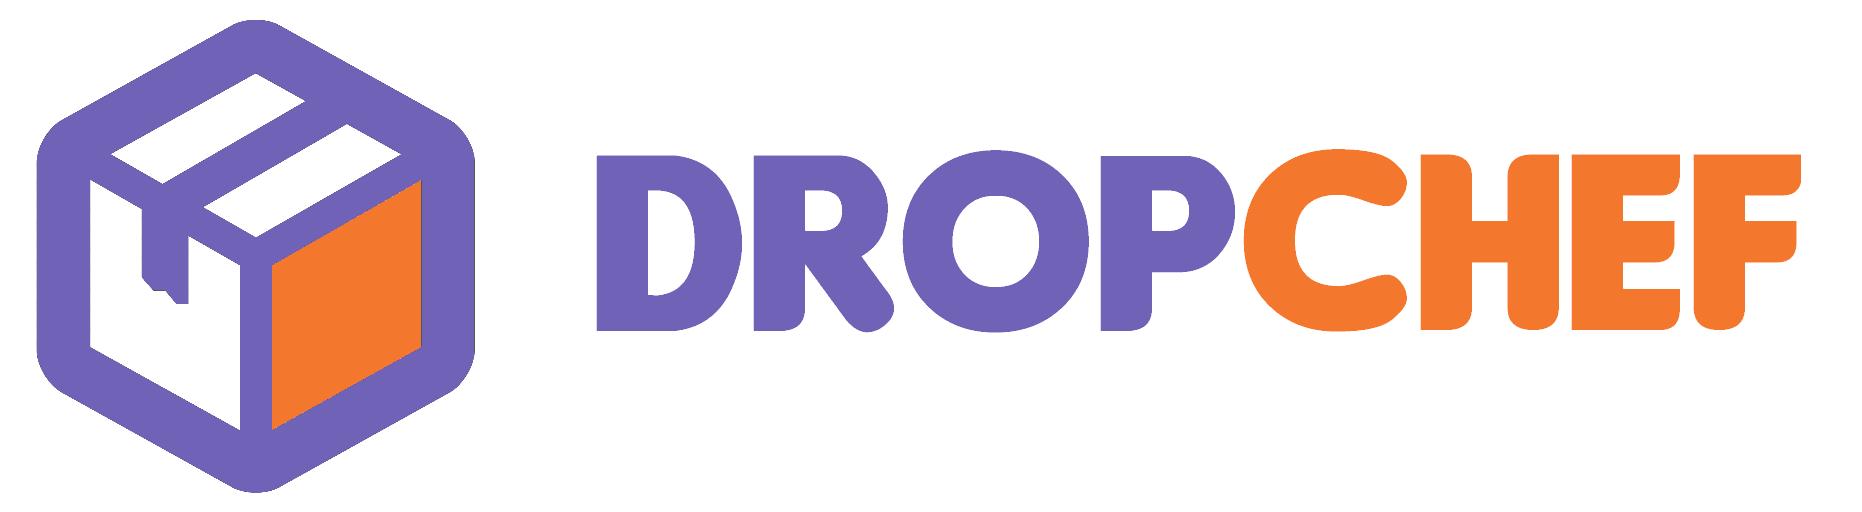 Dropchef